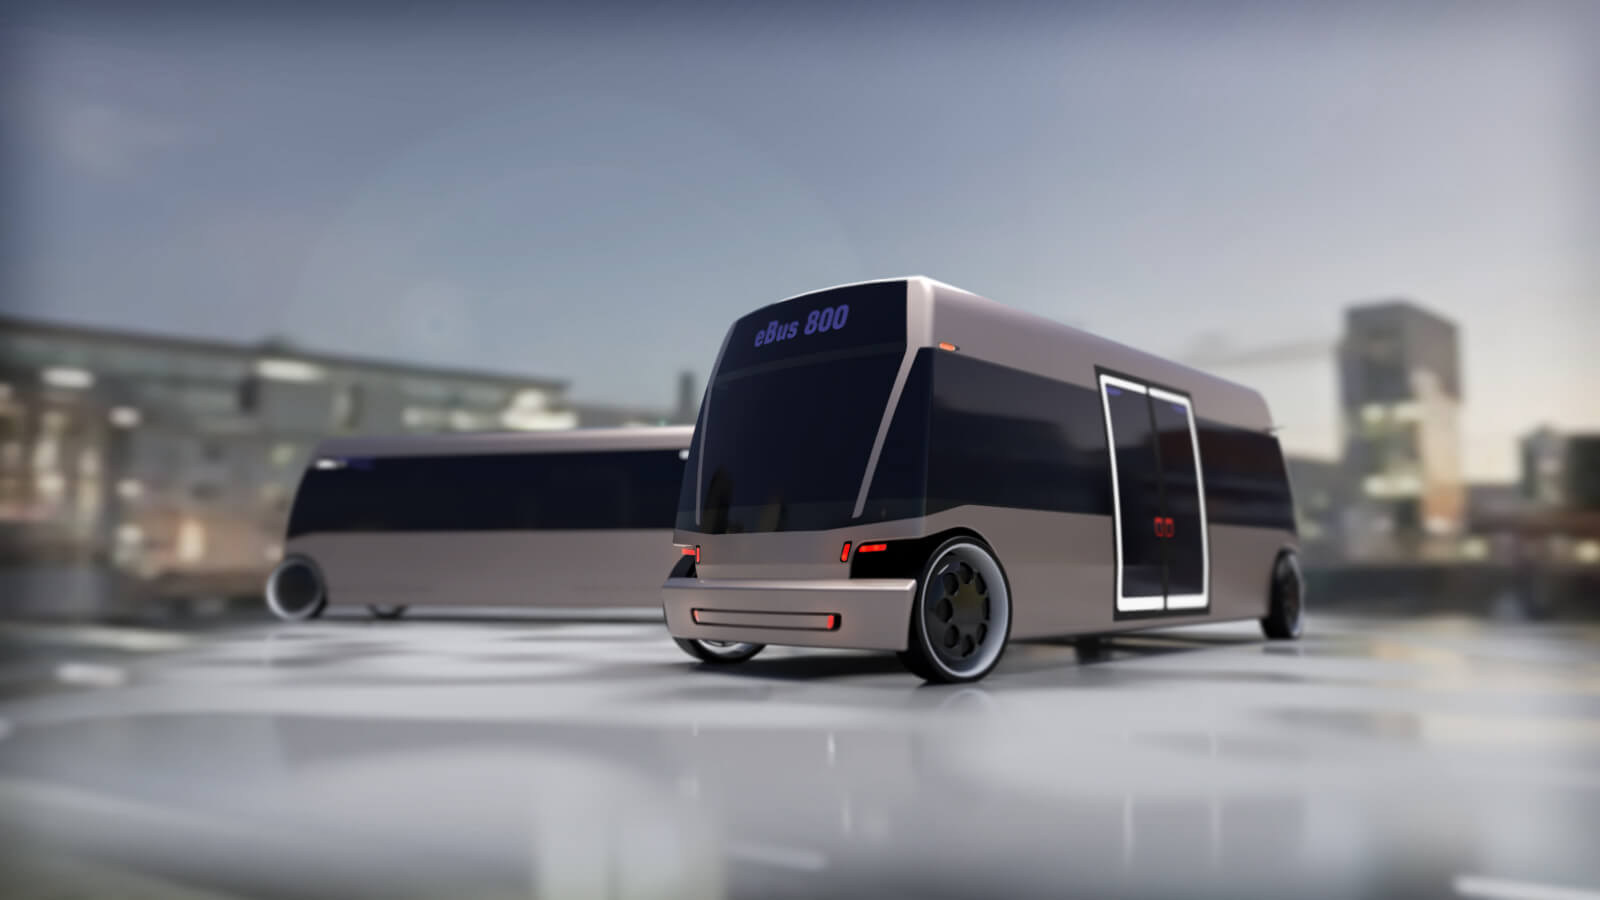 EBus Concept by Doellmann Design, driverless electric shuttle, DDA Industrial Design